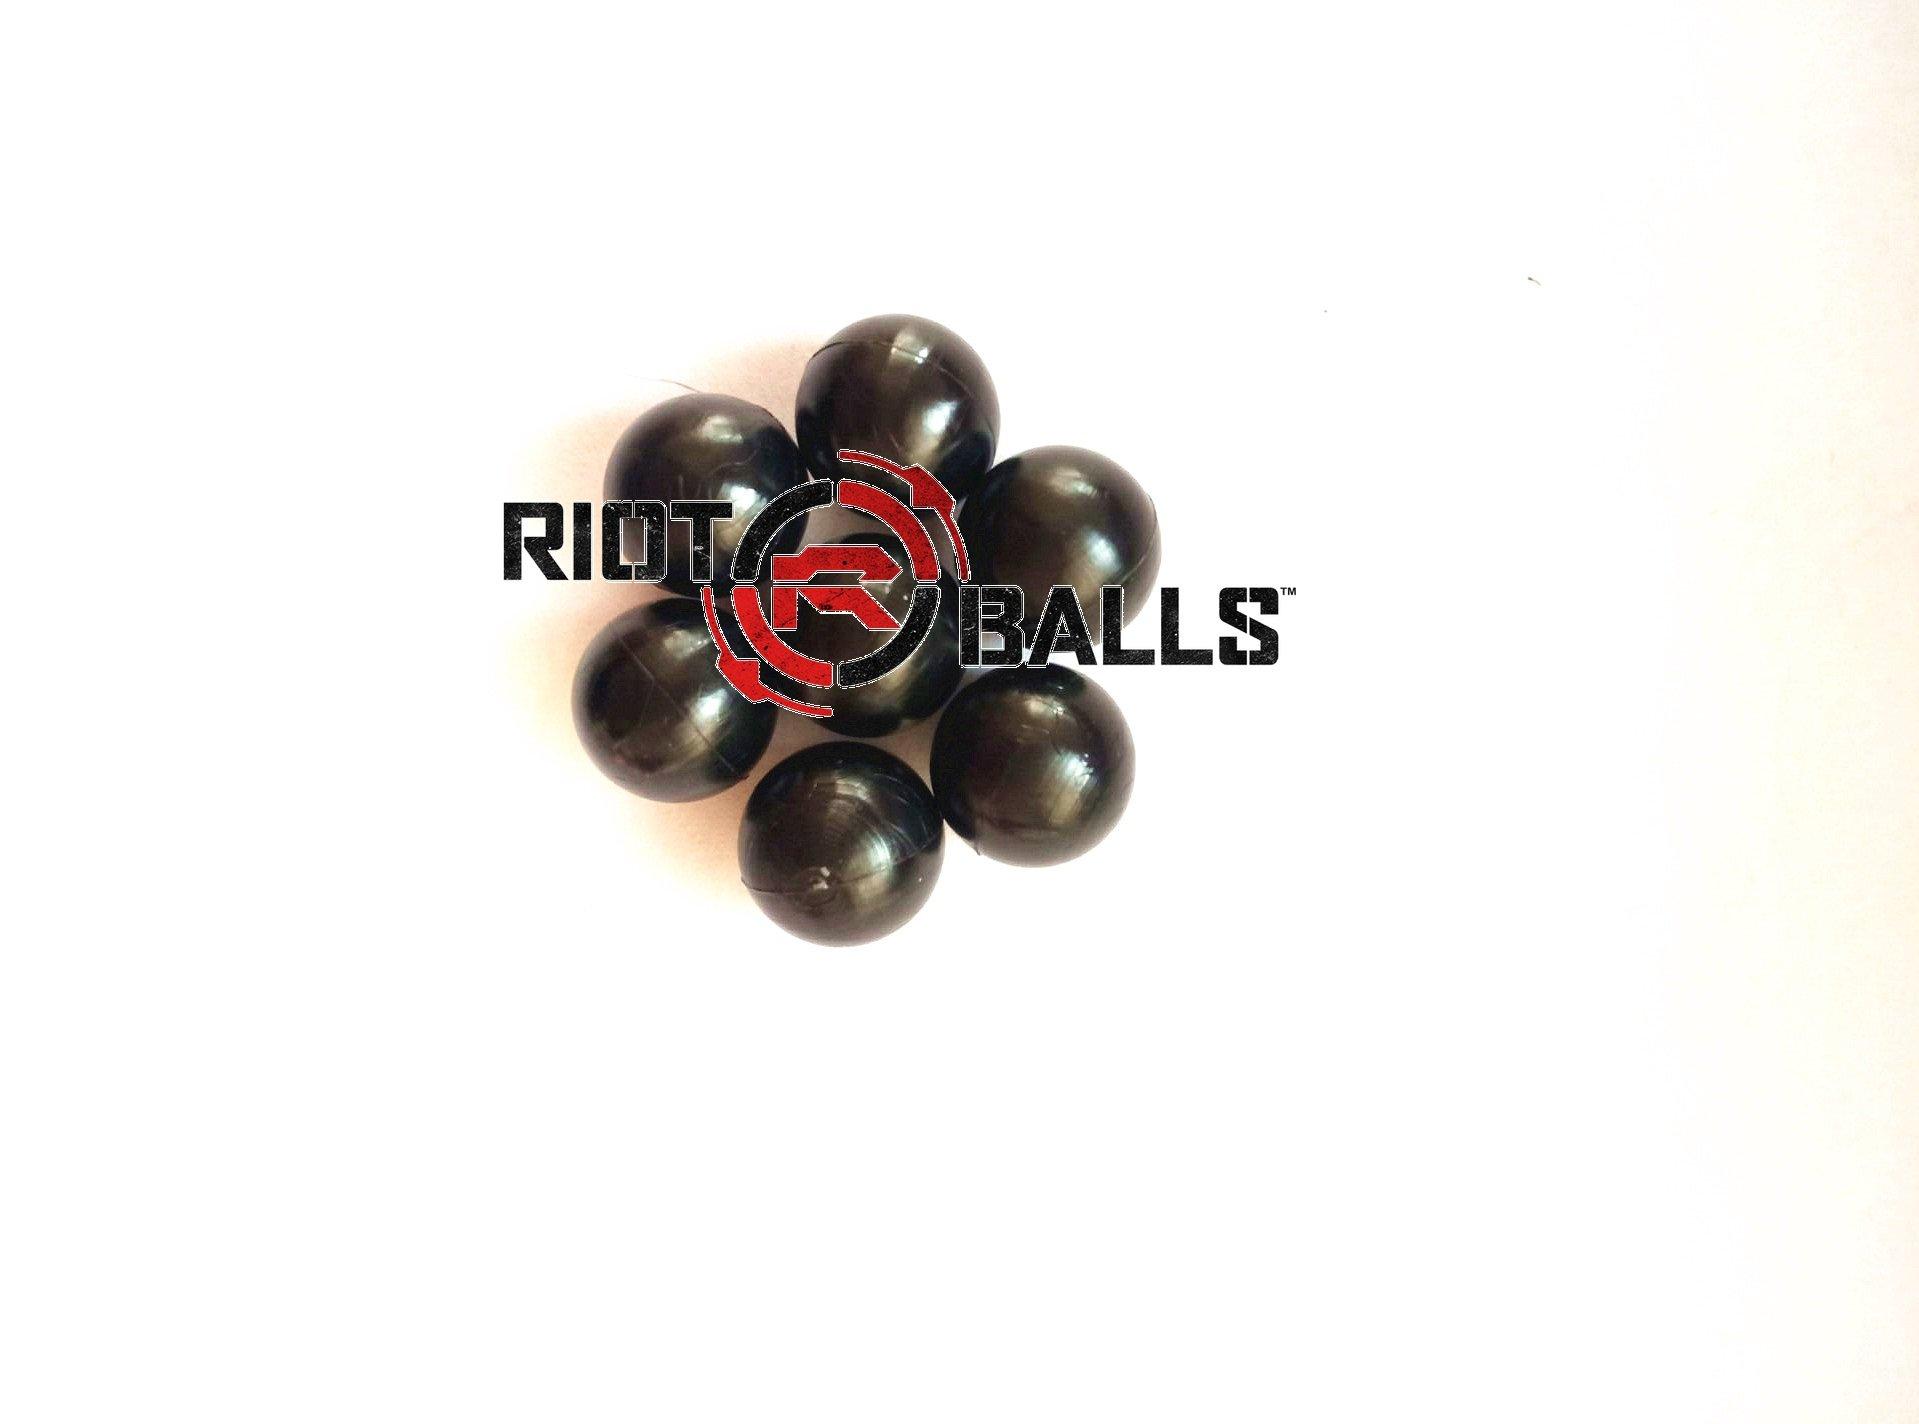 500 Count X 0.43 Cal. Black PVC/Nylon Riot Balls Self Defense Less Lethal Practice Paintball